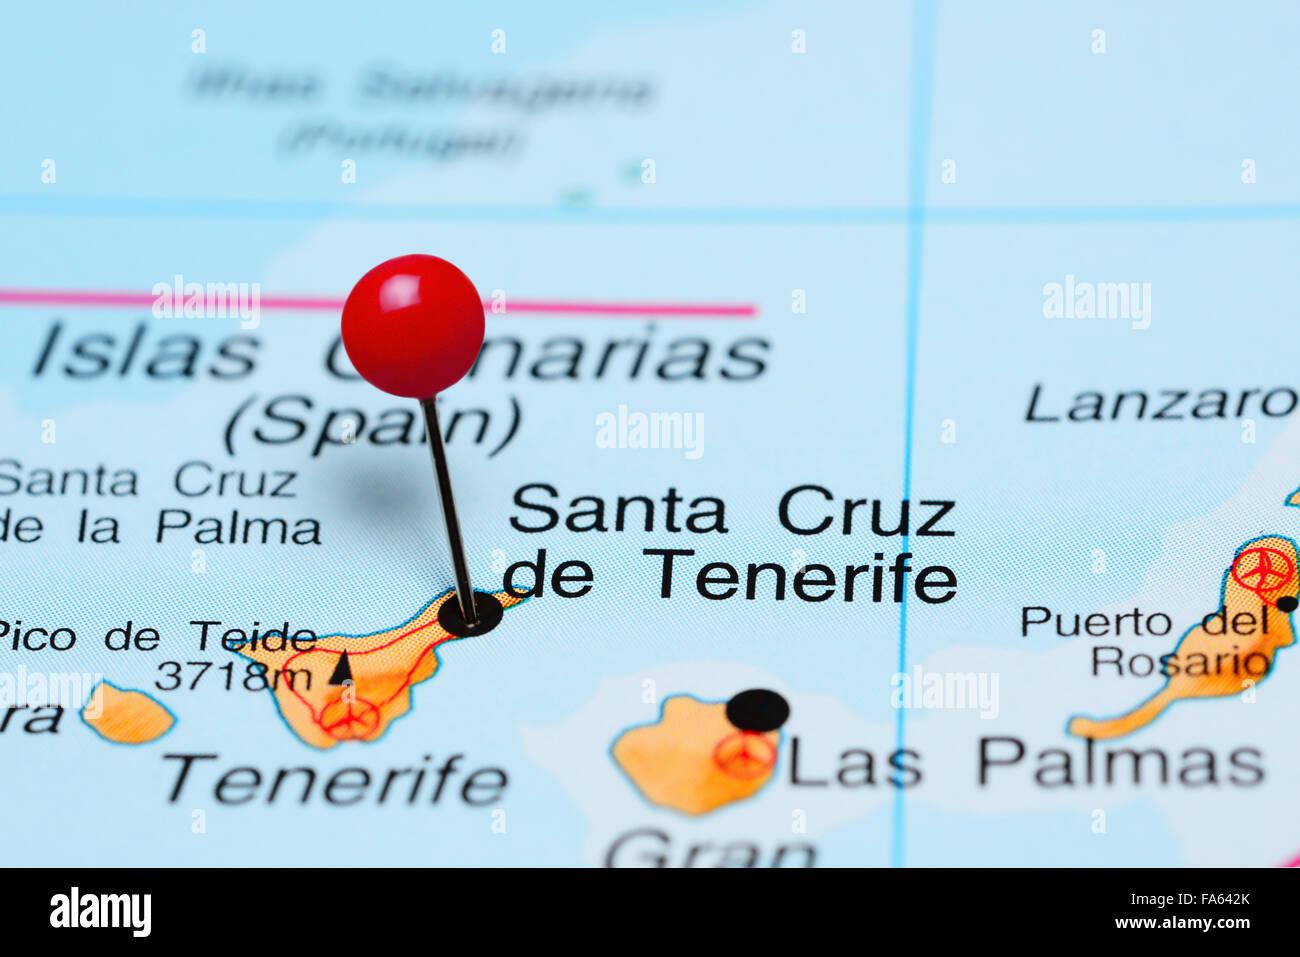 Santa Cruz De Tenerife Pinned On A Map Of Africa Stock Photo